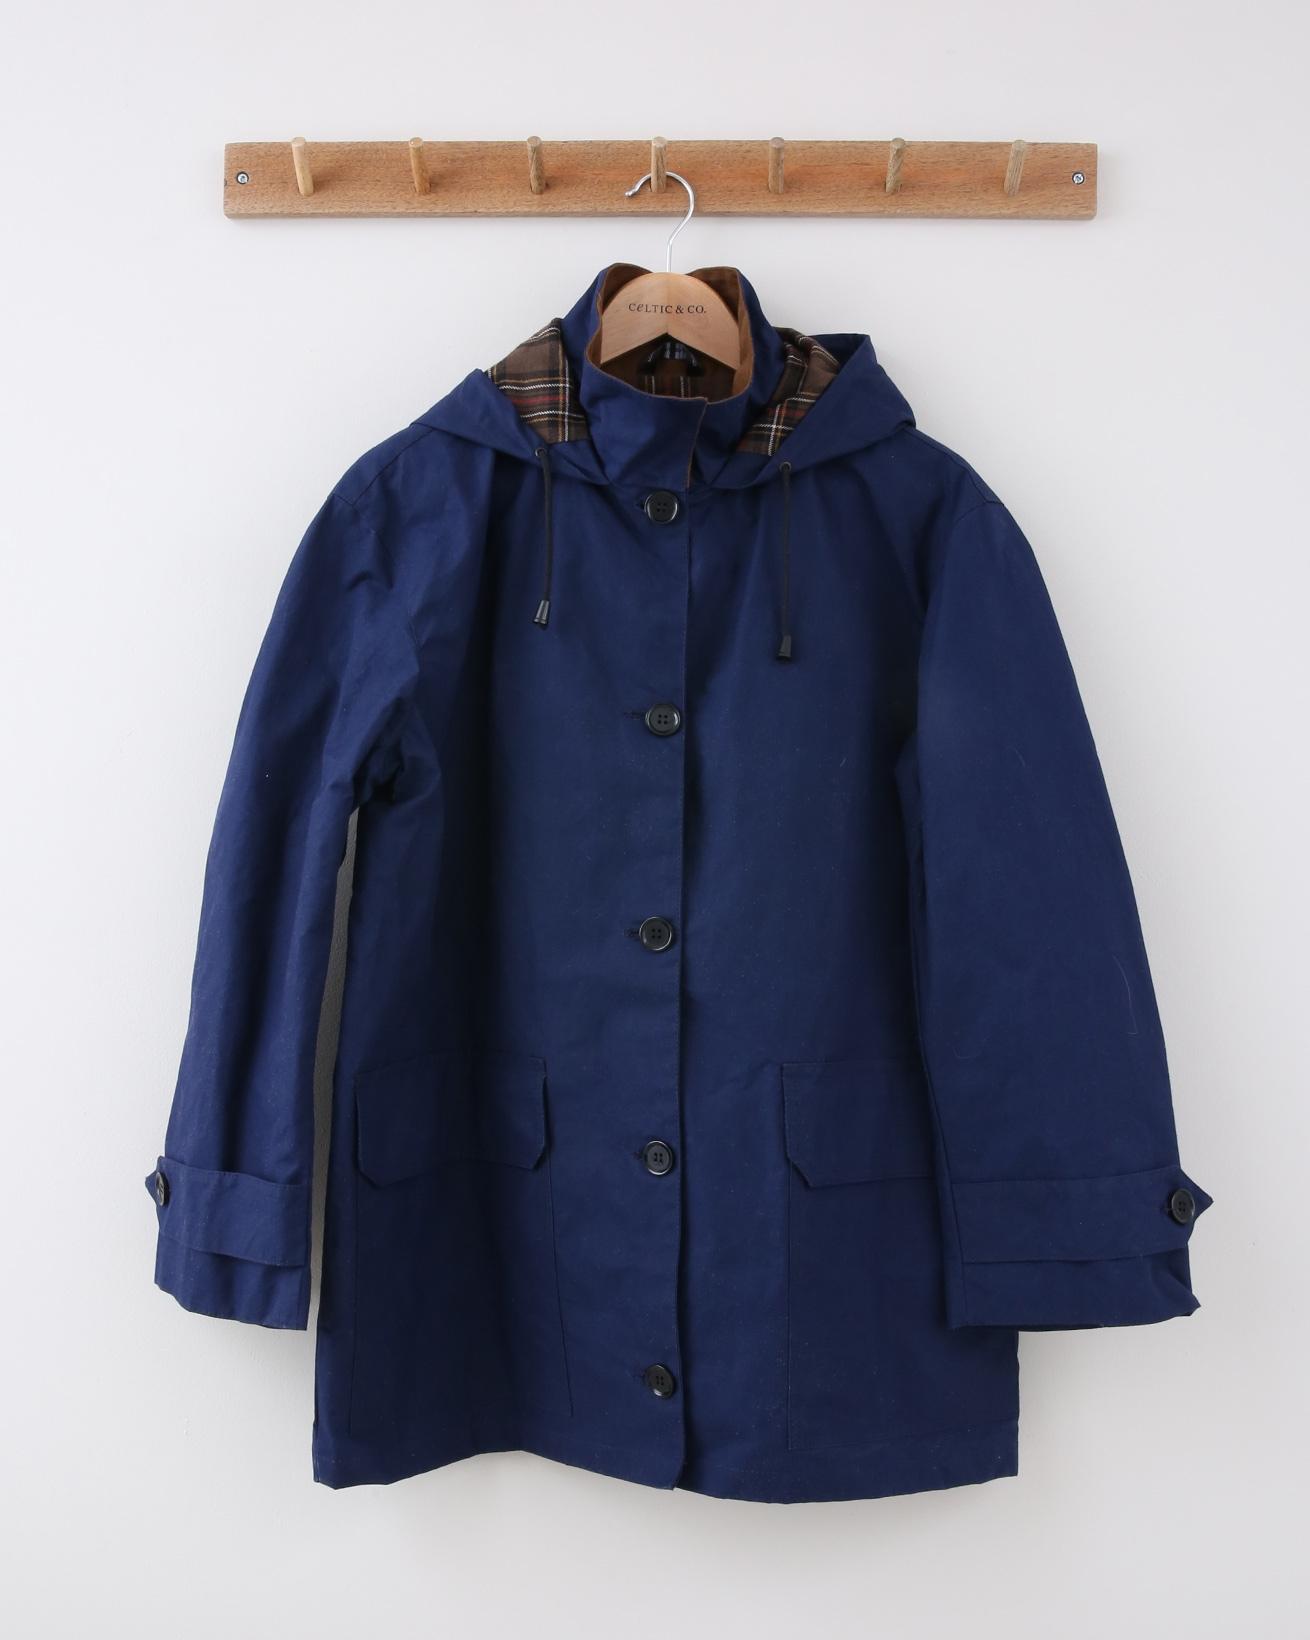 Hybrid Aero Wax Cotton Jacket - Size 10 - Blue - 1498